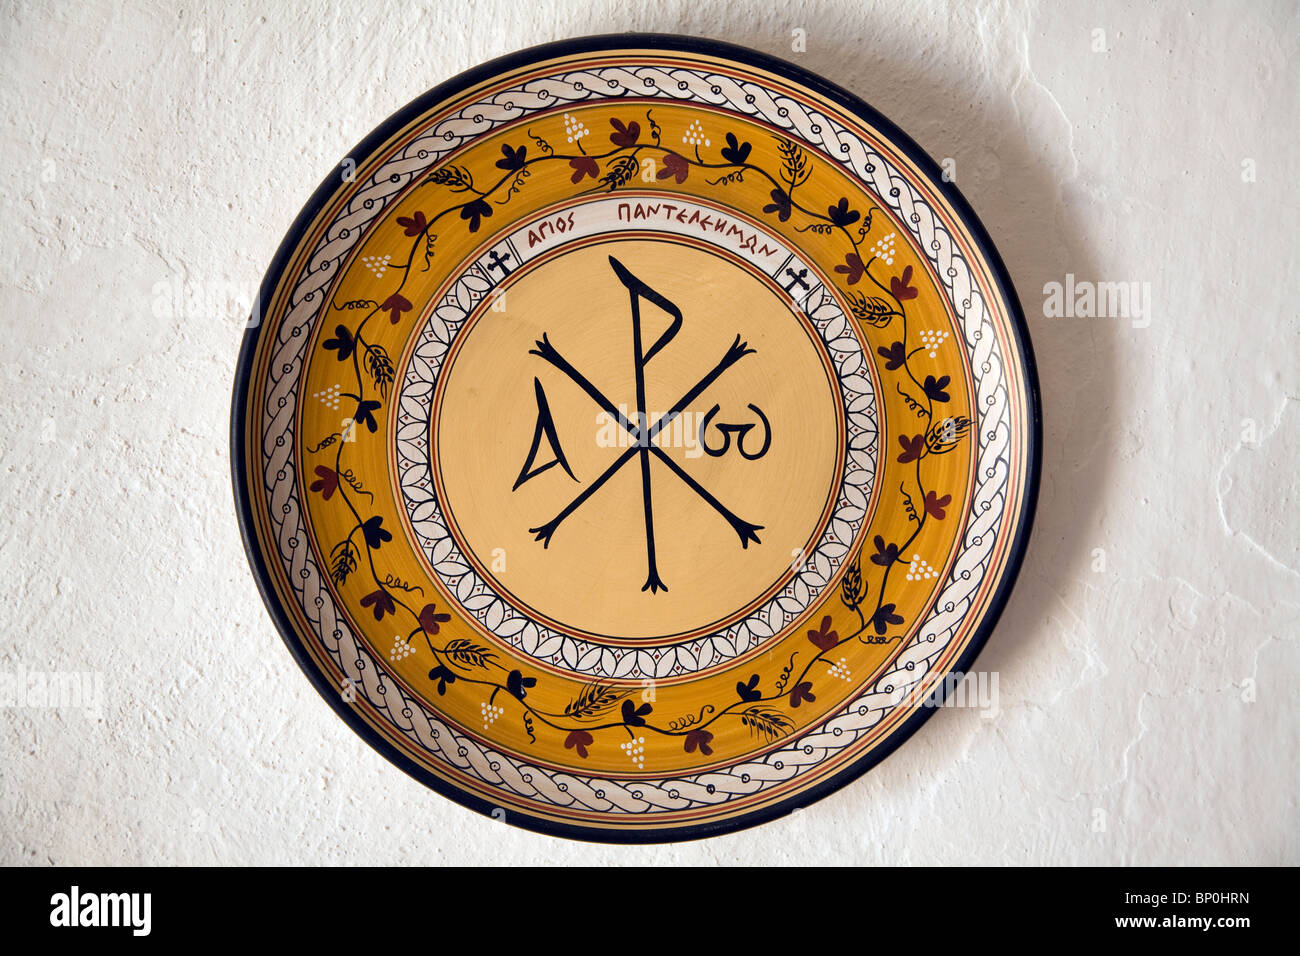 Symbols Of Rhodes Stock Photos Symbols Of Rhodes Stock Images Alamy